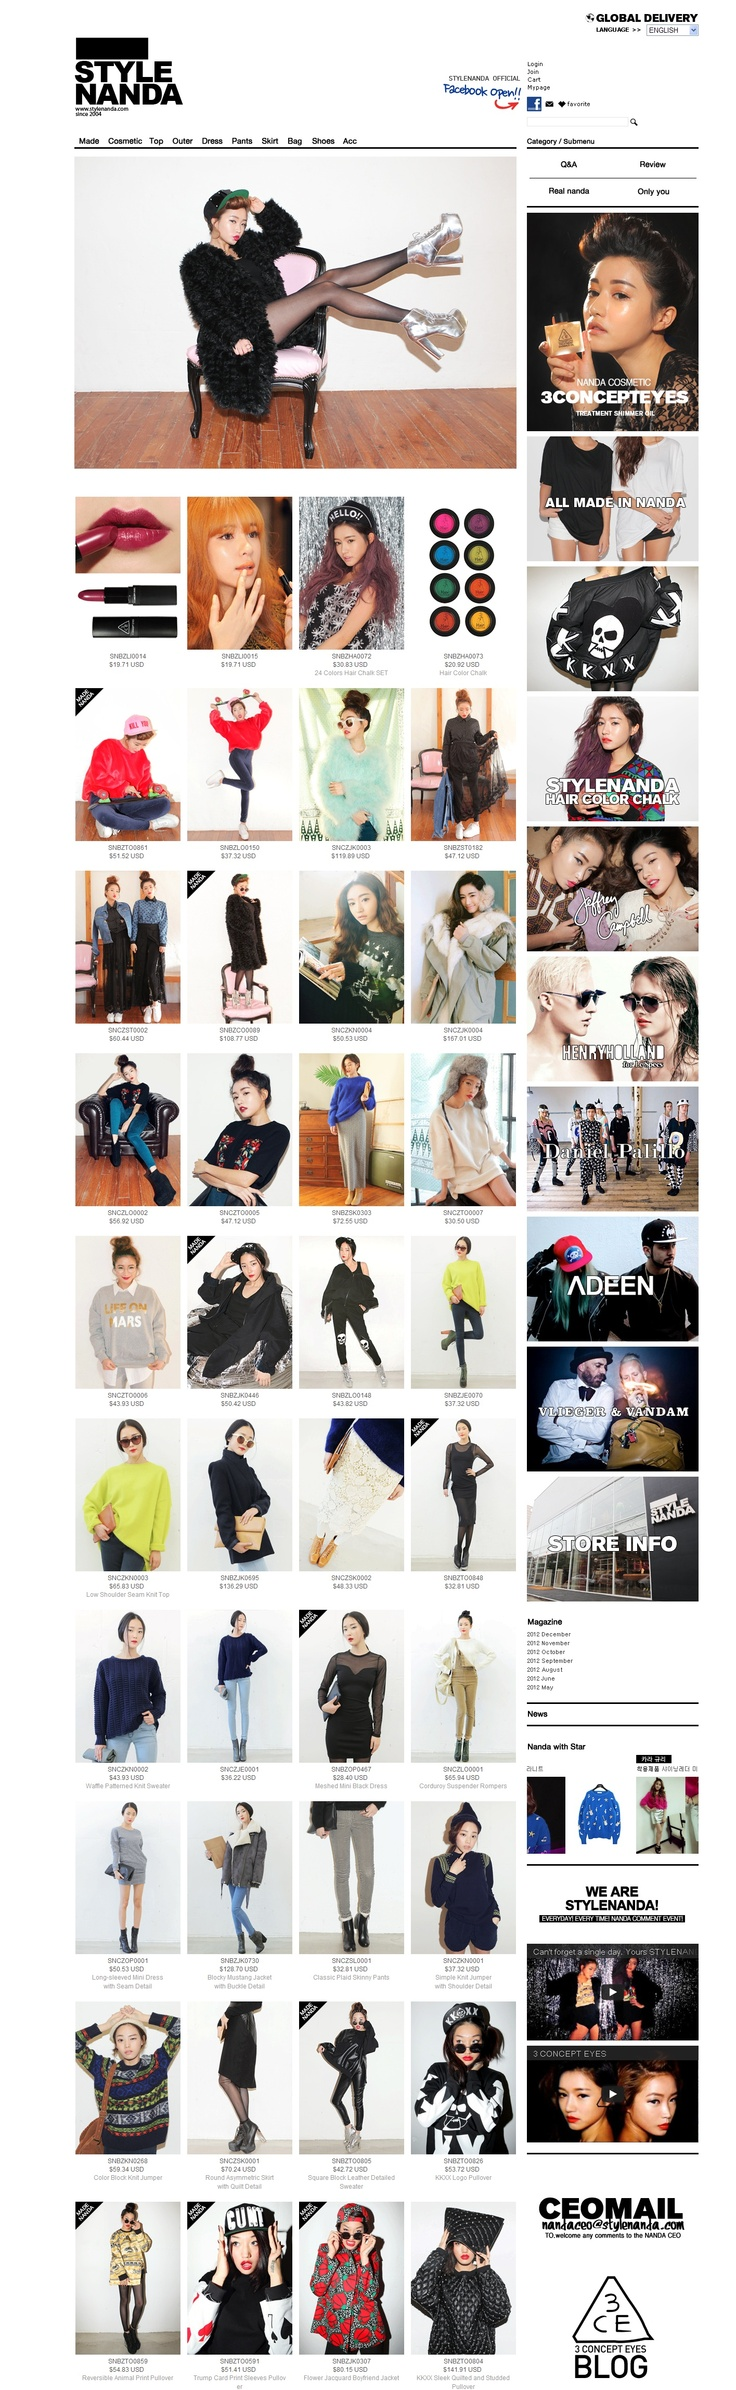 welcome to stylenanda korea no.1 online shoping mall  en.stylenanda.com